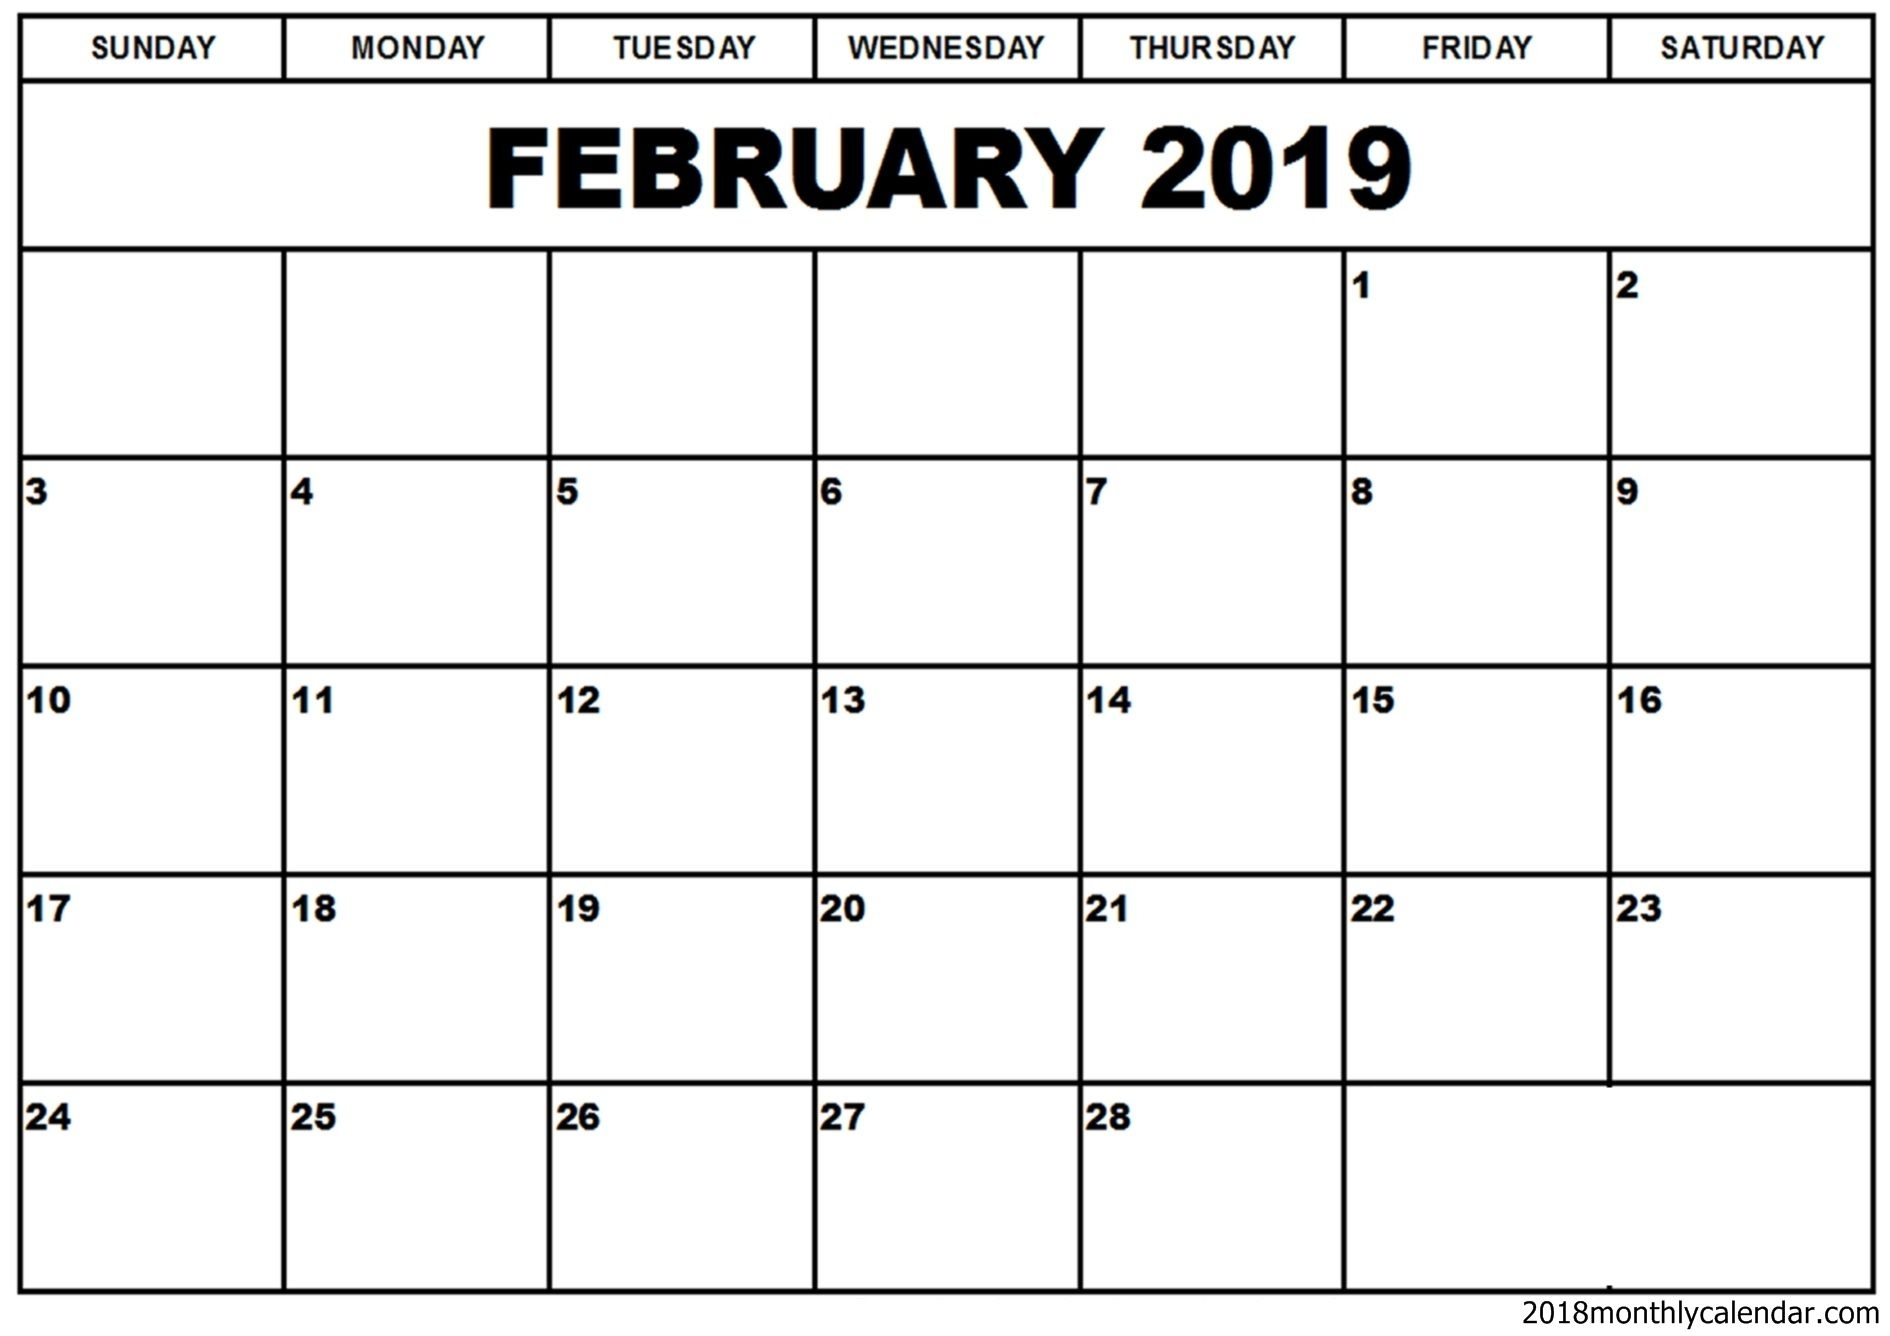 February 2019 Calendar Word Template | Free Printable Monthly with 12 Month Calendar Word Template